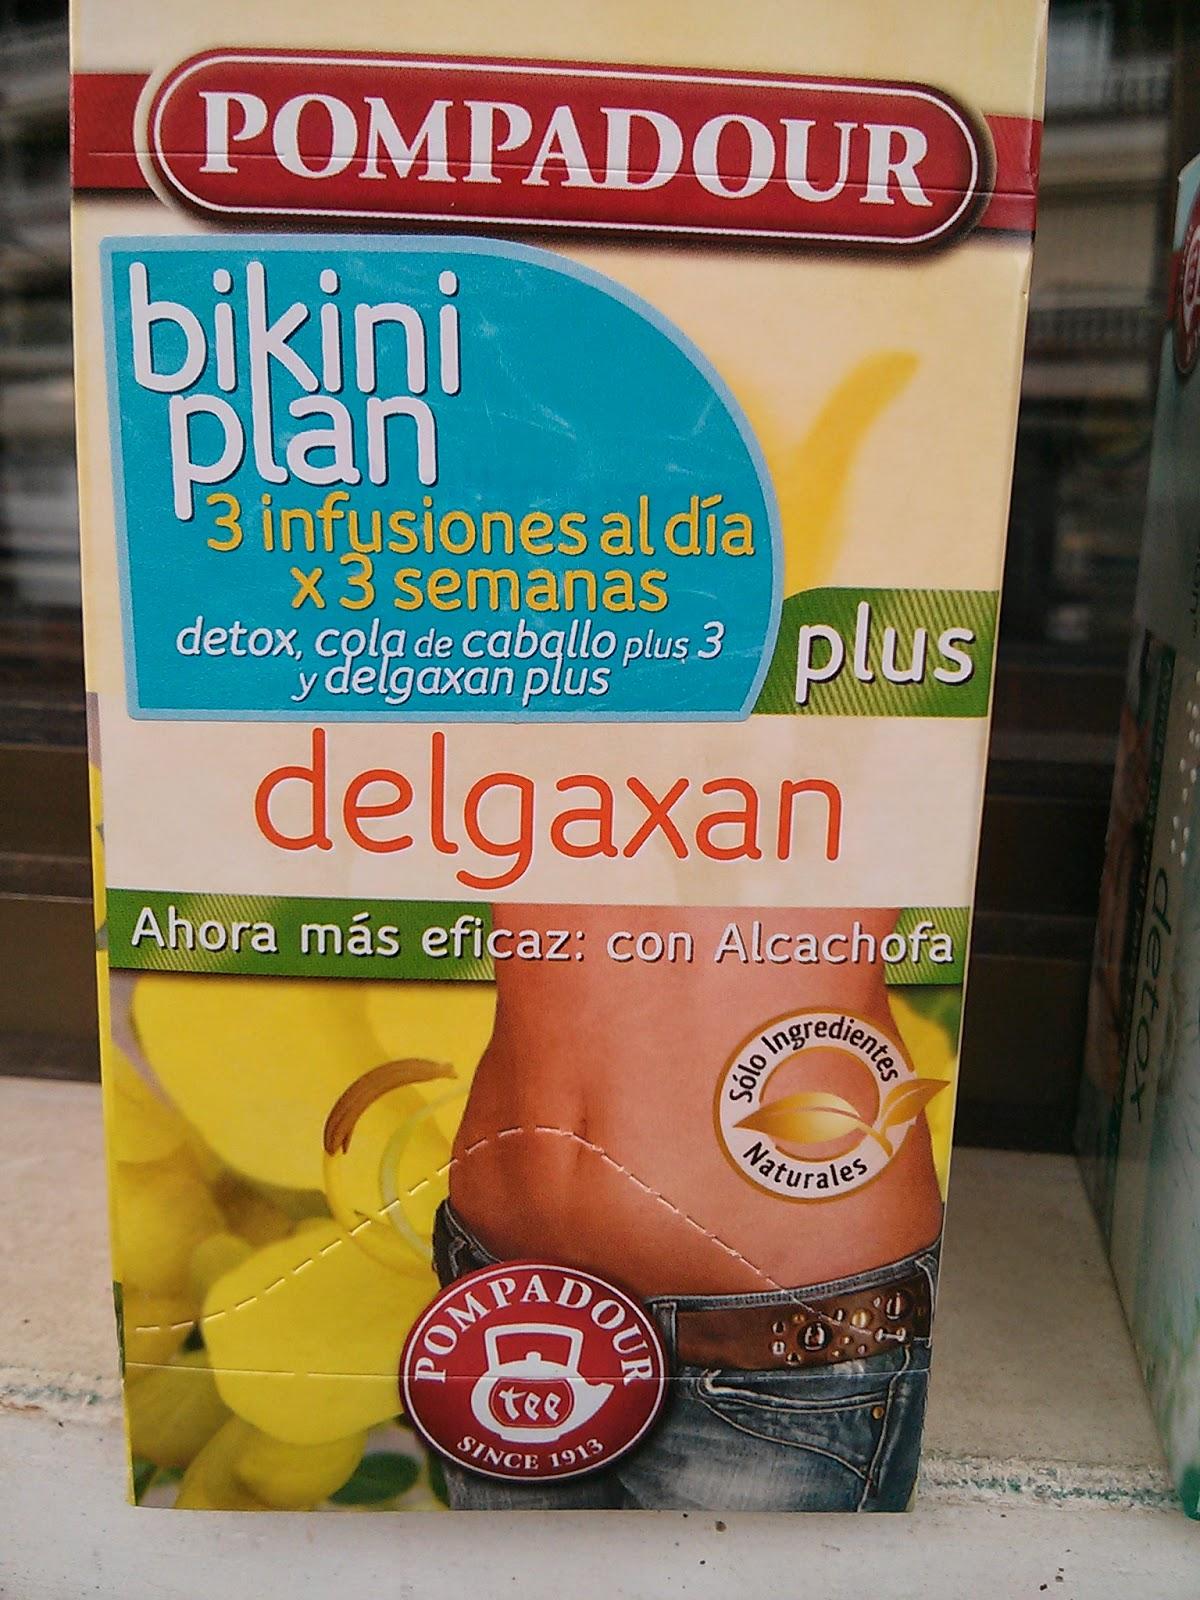 Delgaxan Plus pompadour